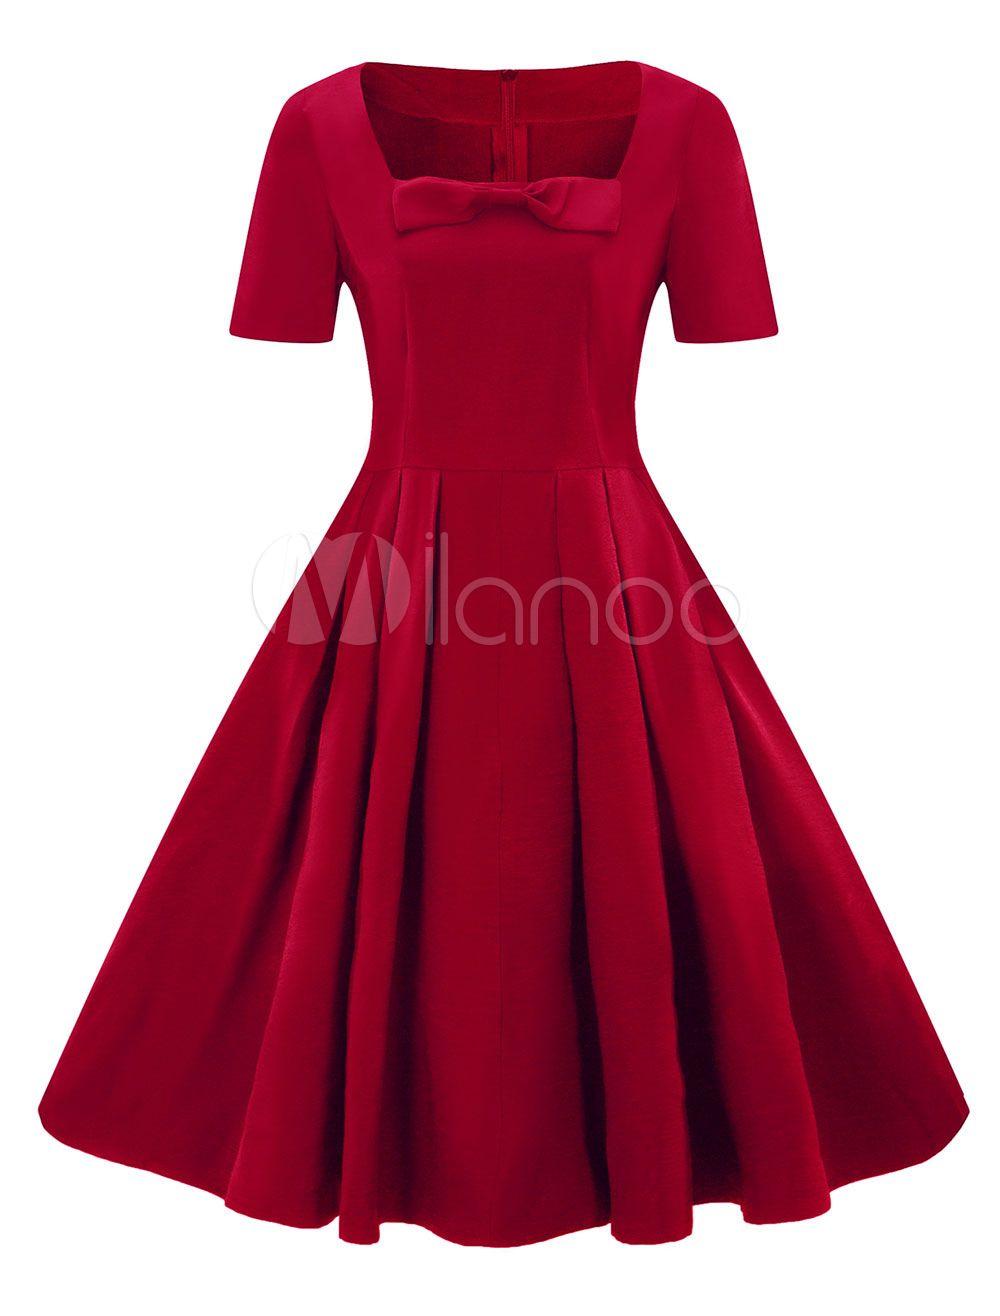 Solid Bow Vintage Retro Women Dress